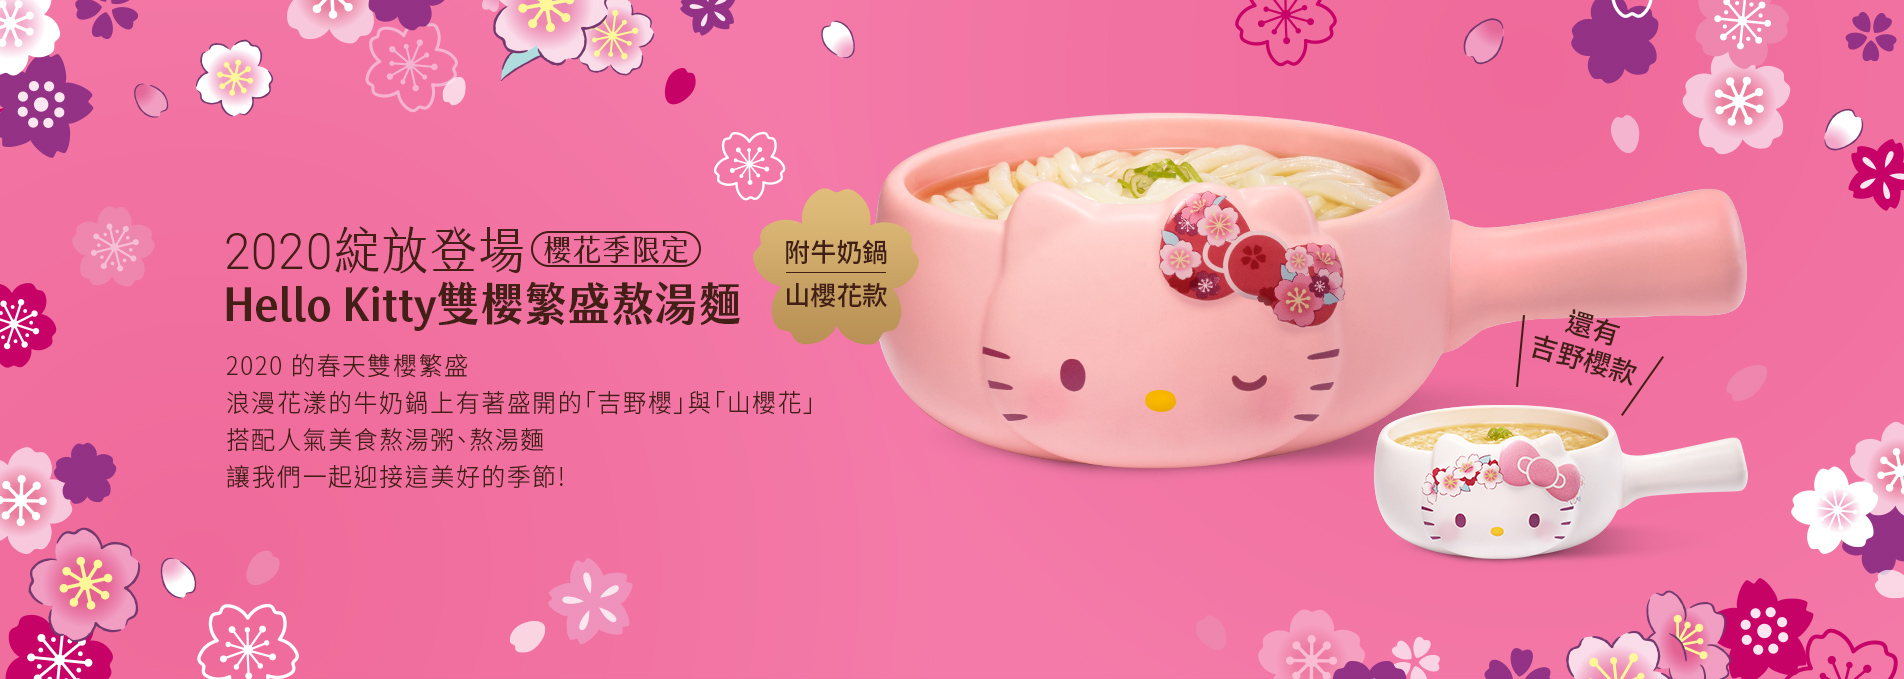 Hello Kitty雙櫻繁盛熬湯麵(附牛奶鍋-山櫻花款)